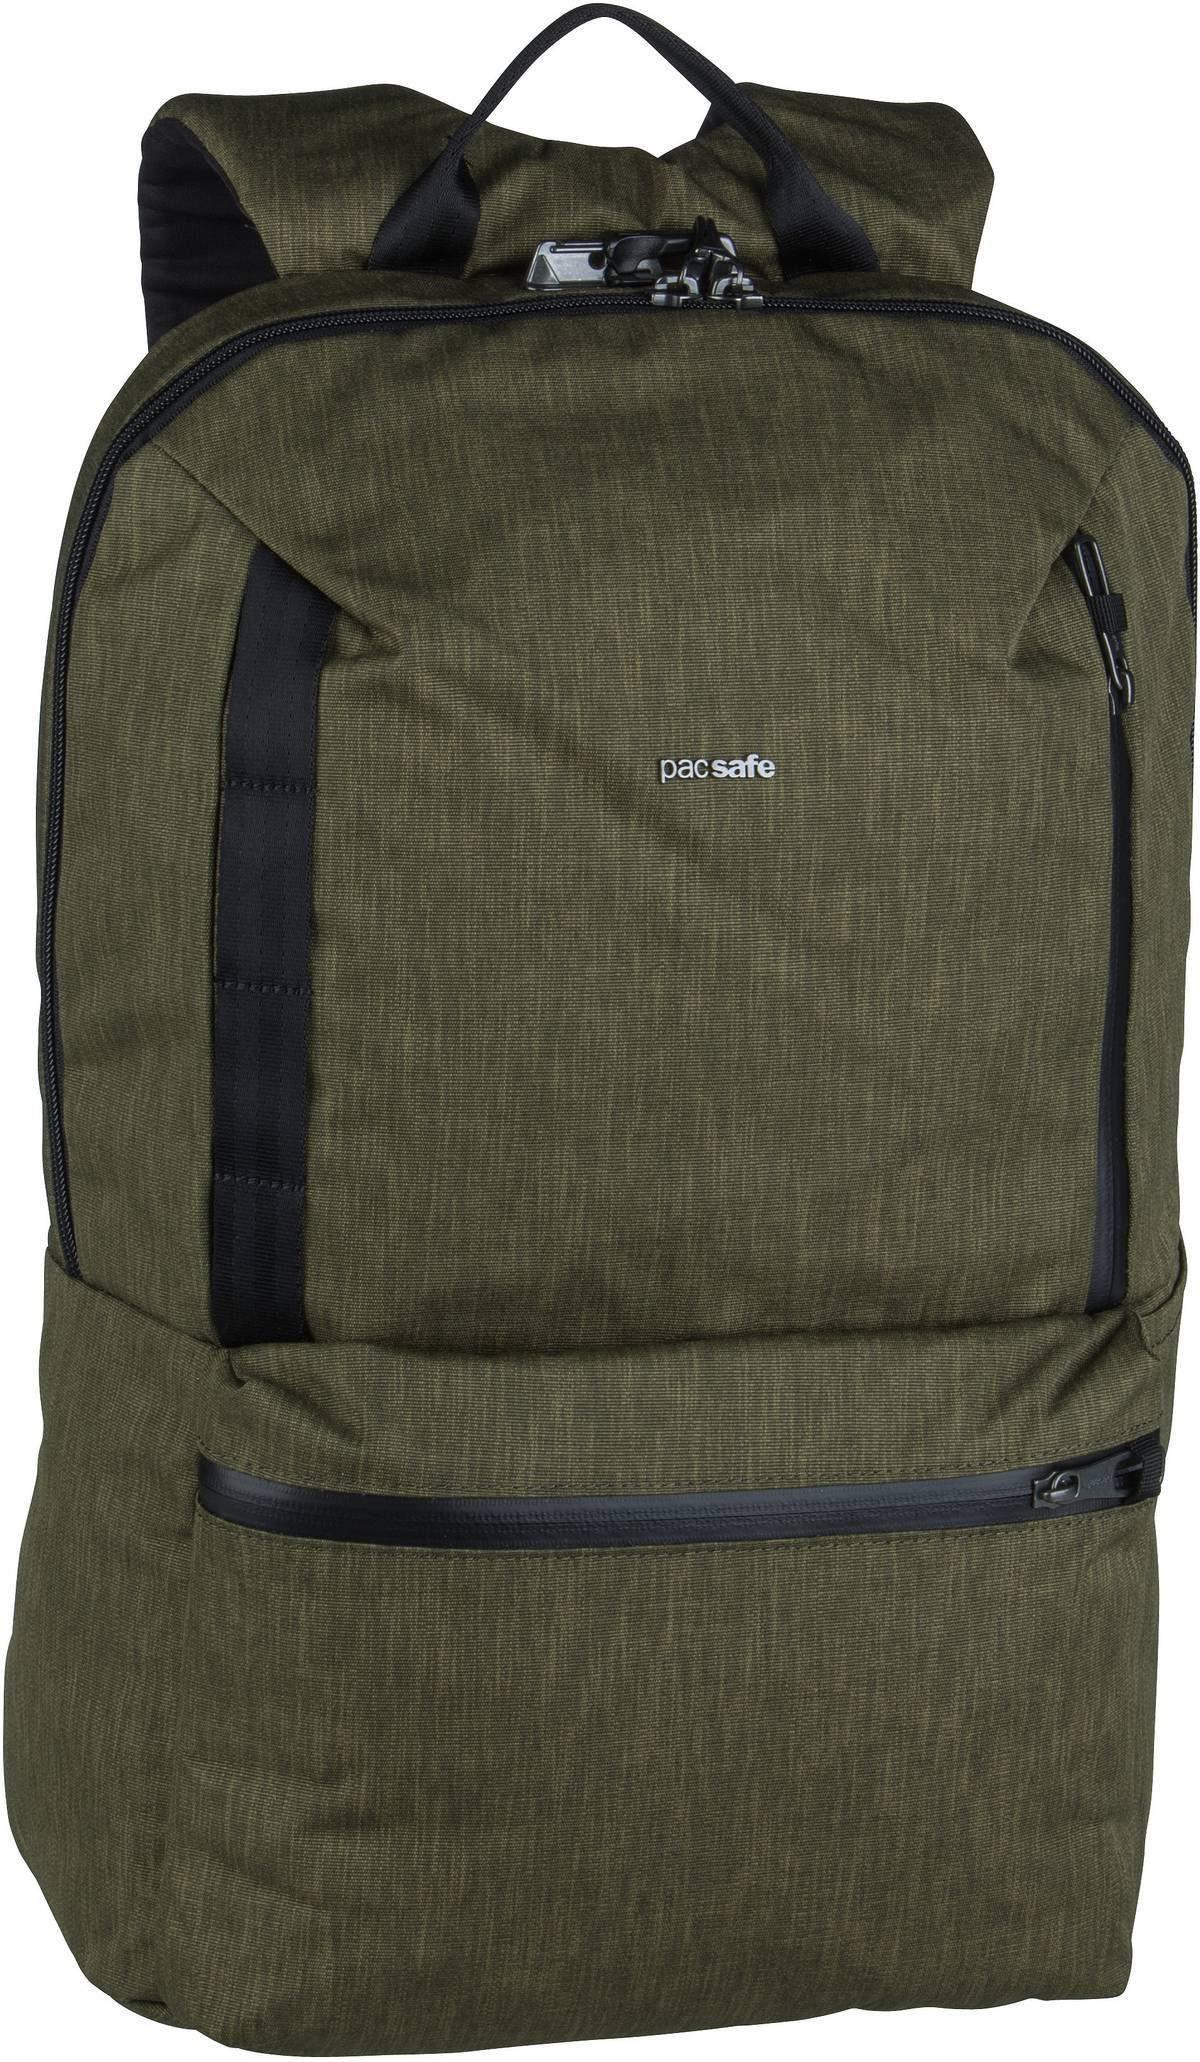 Unisex Pacsafe Rucksack / Daypack »Metrosafe X Backpack« blau, grau, grün   00688334055448